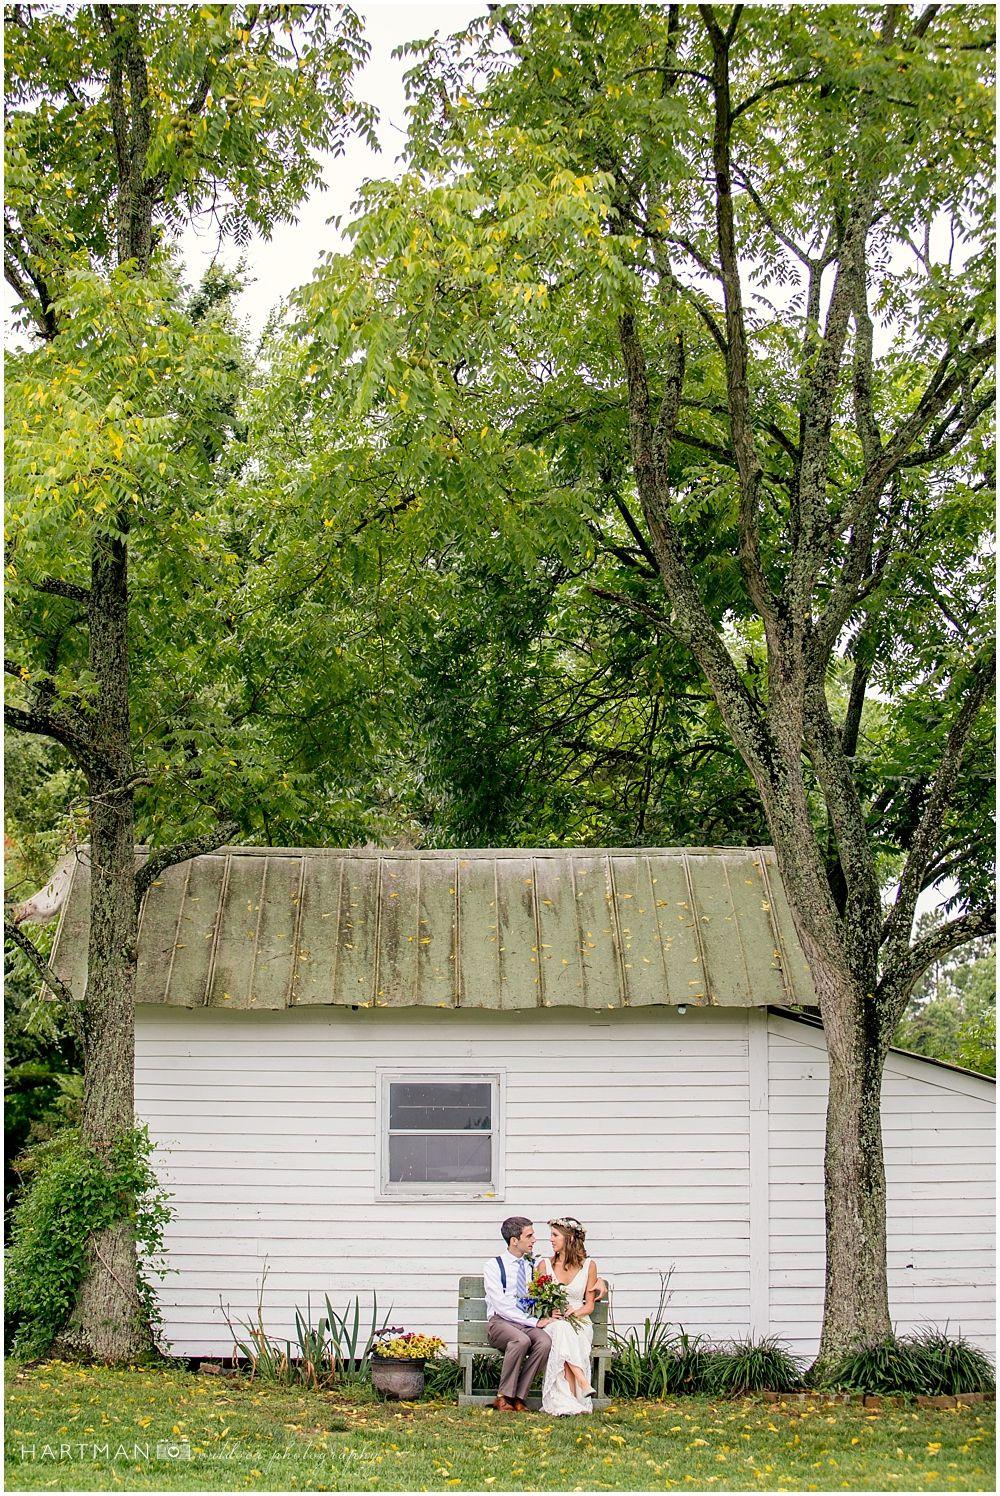 Hodgkin Valley Farm Wedding Pleasant Garden North Carolina Bride And Groom Under Tall Tree Rustic Portrait Bohemian Outdoor: Outdoor Wedding Venue North Carolina At Reisefeber.org